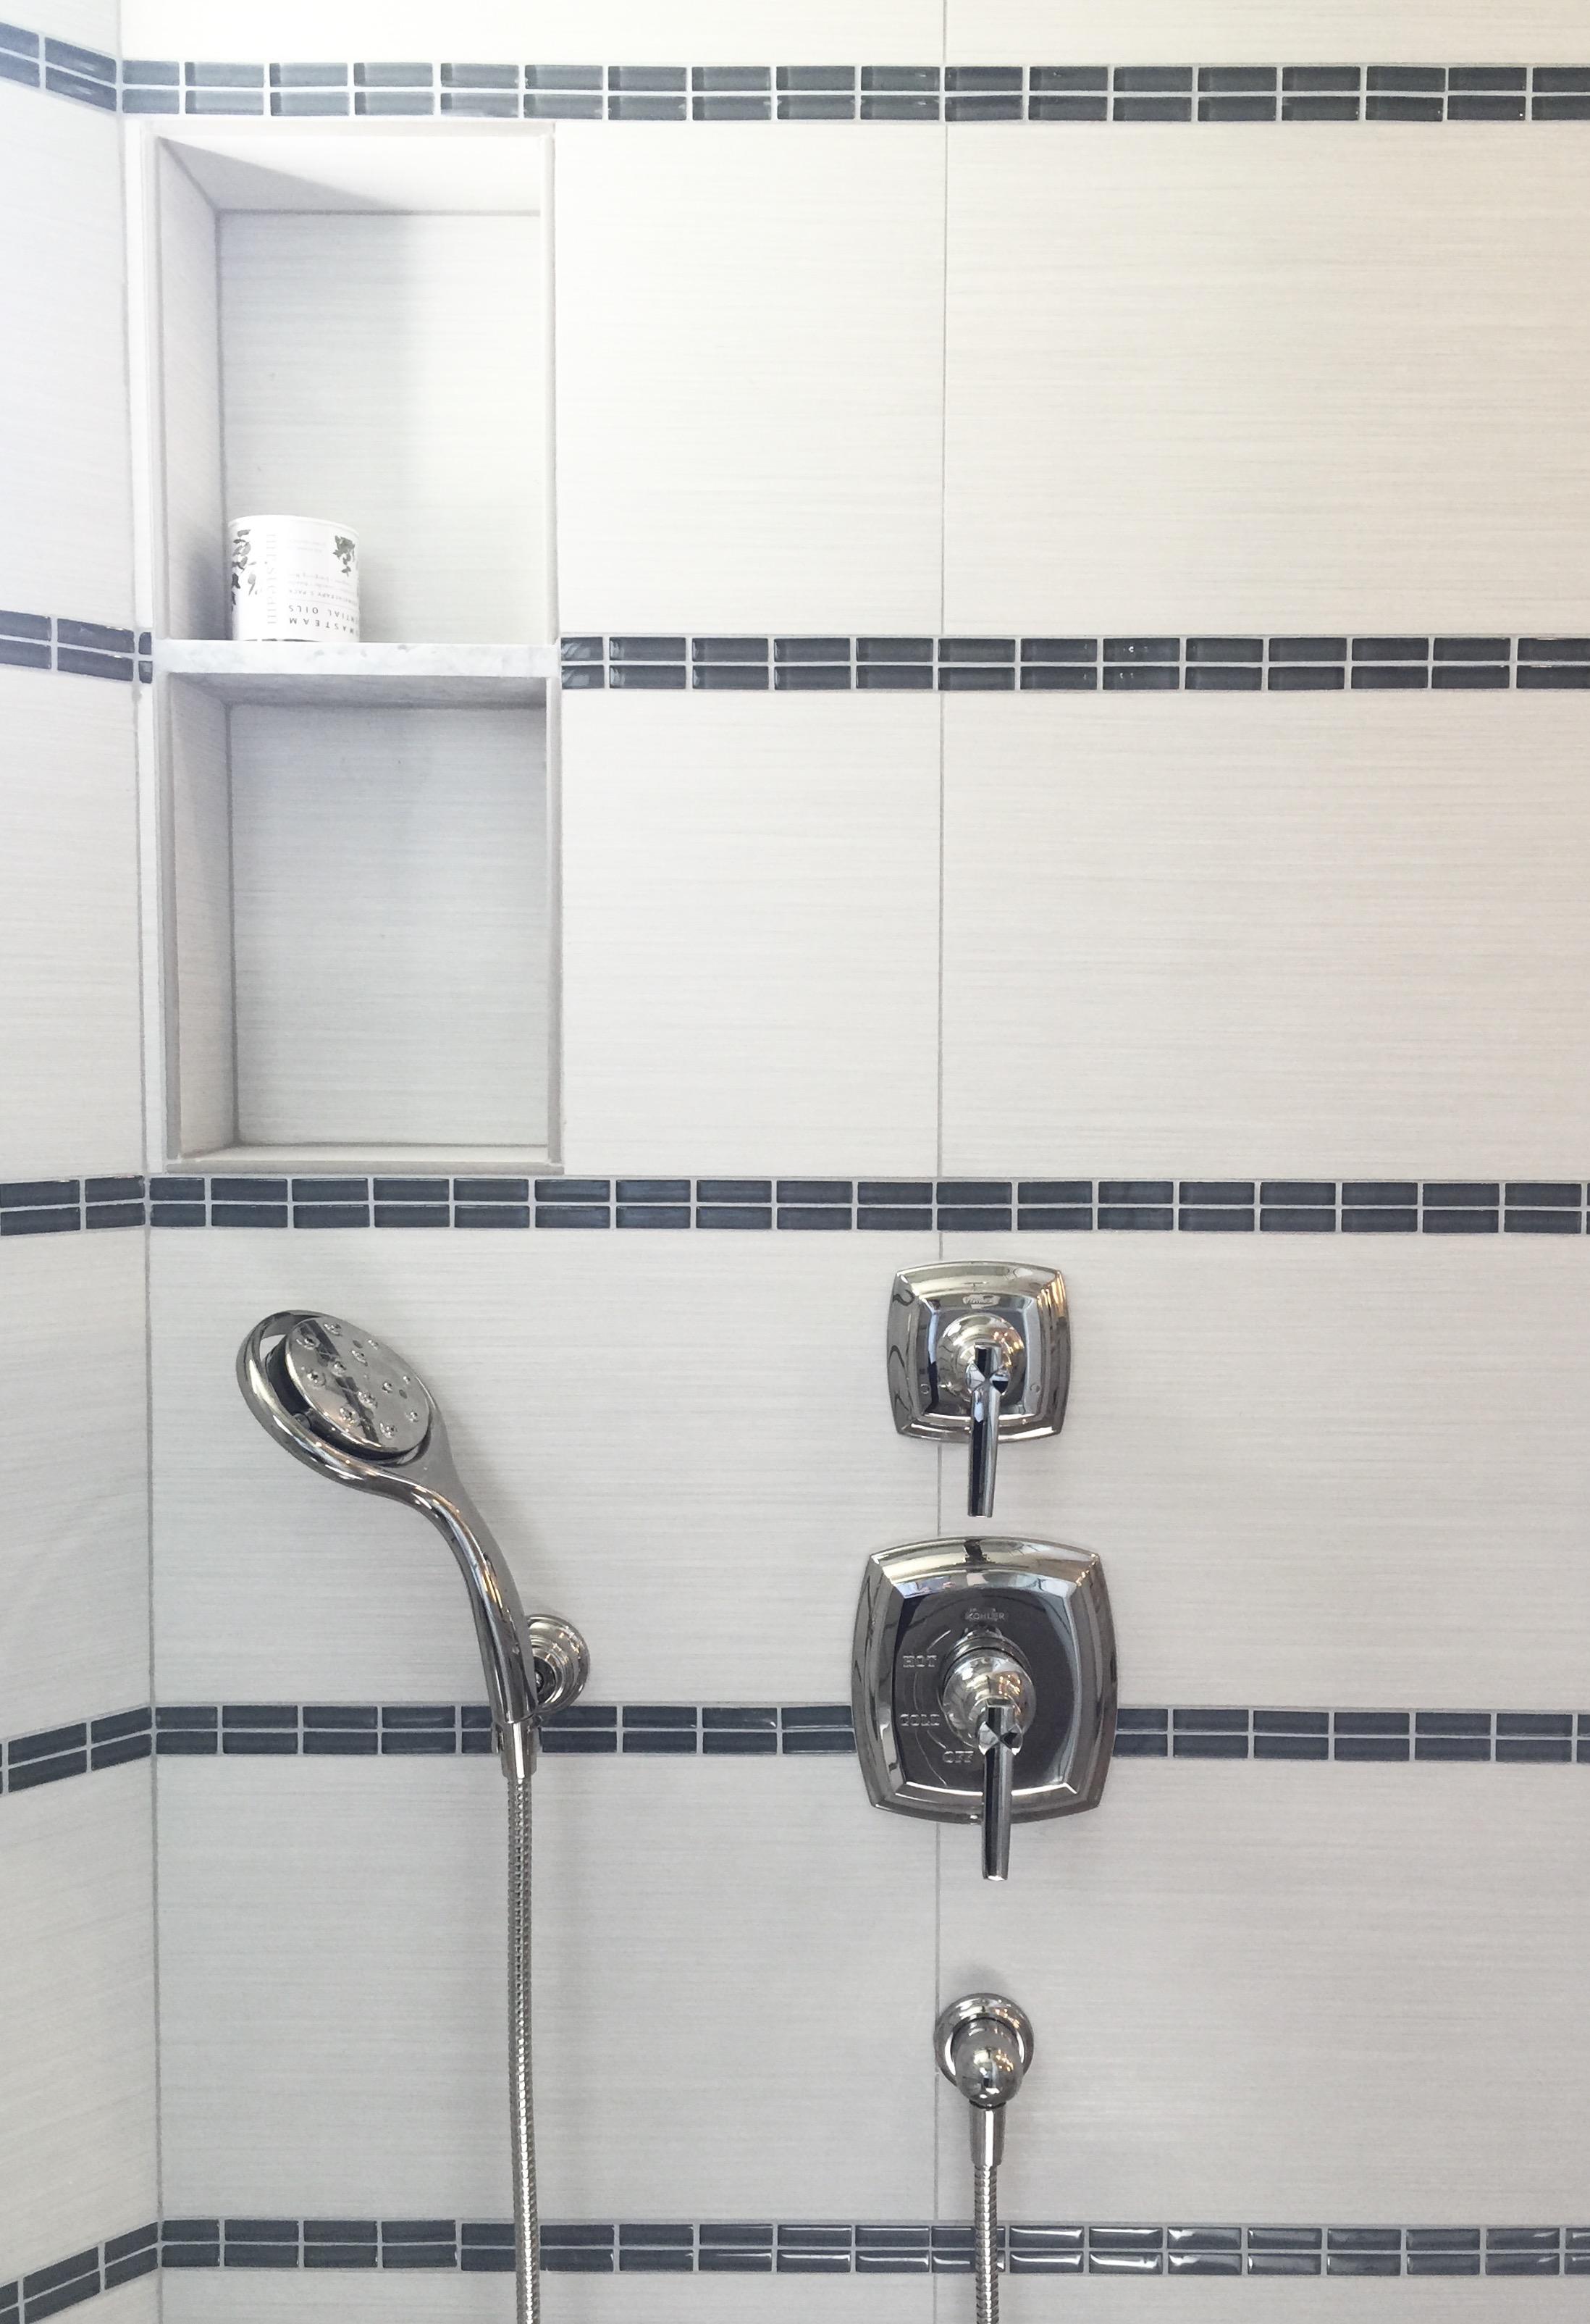 25 Beautiful Shower Niches For Your Beautiful Bath Products, Designer: Carla Aston #shampooniche #showerniche